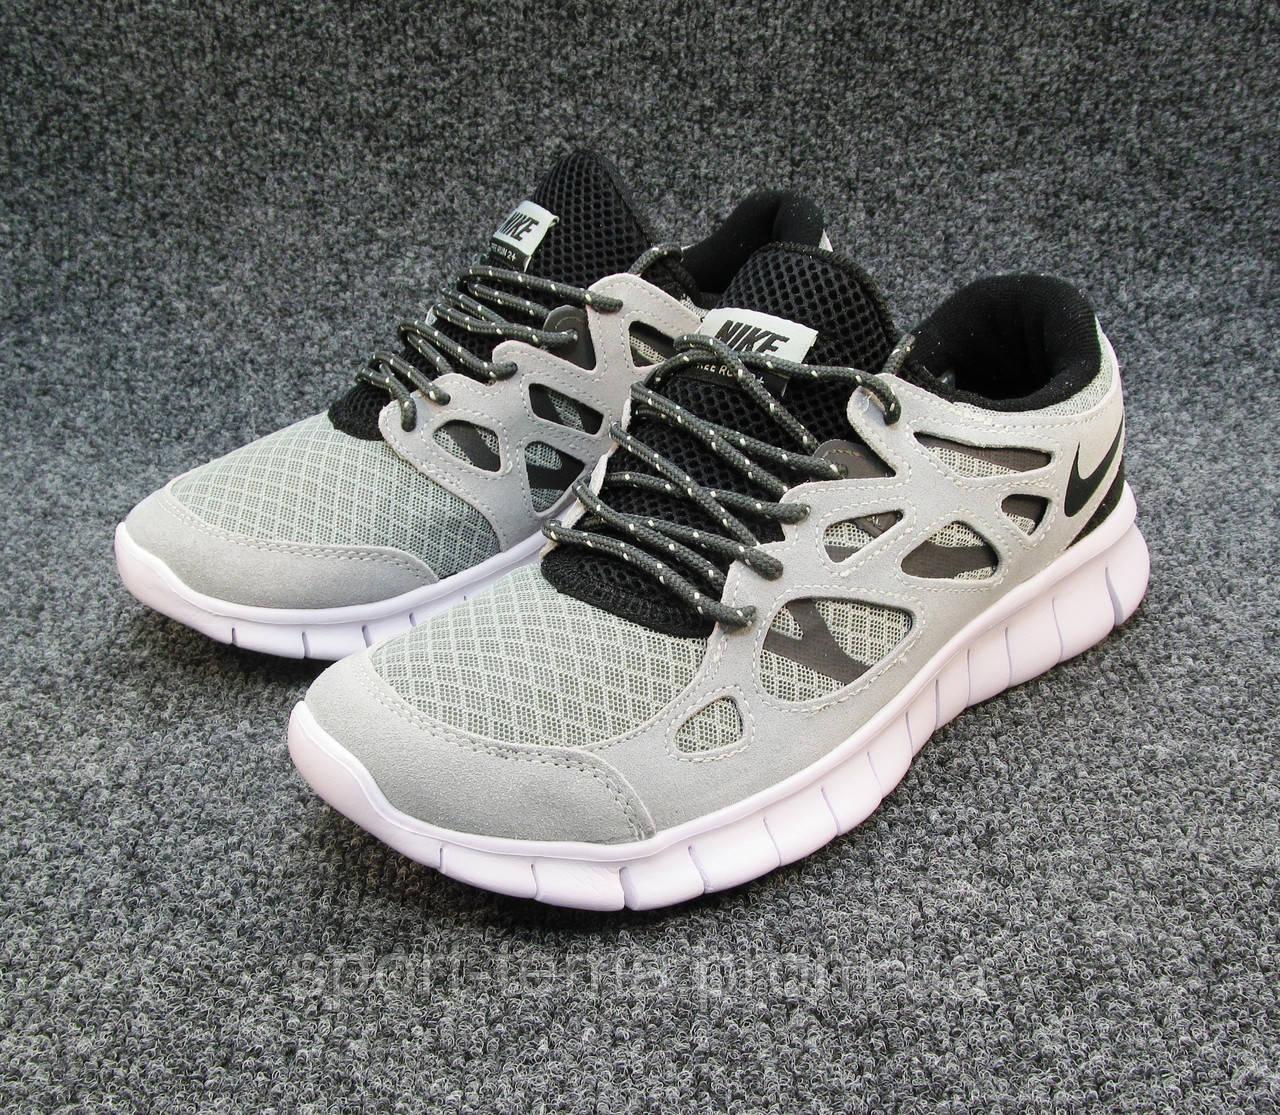 89da0182 Кроссовки мужские Nike Free Run 2+ текстиль светло-серые (найк фри ран)